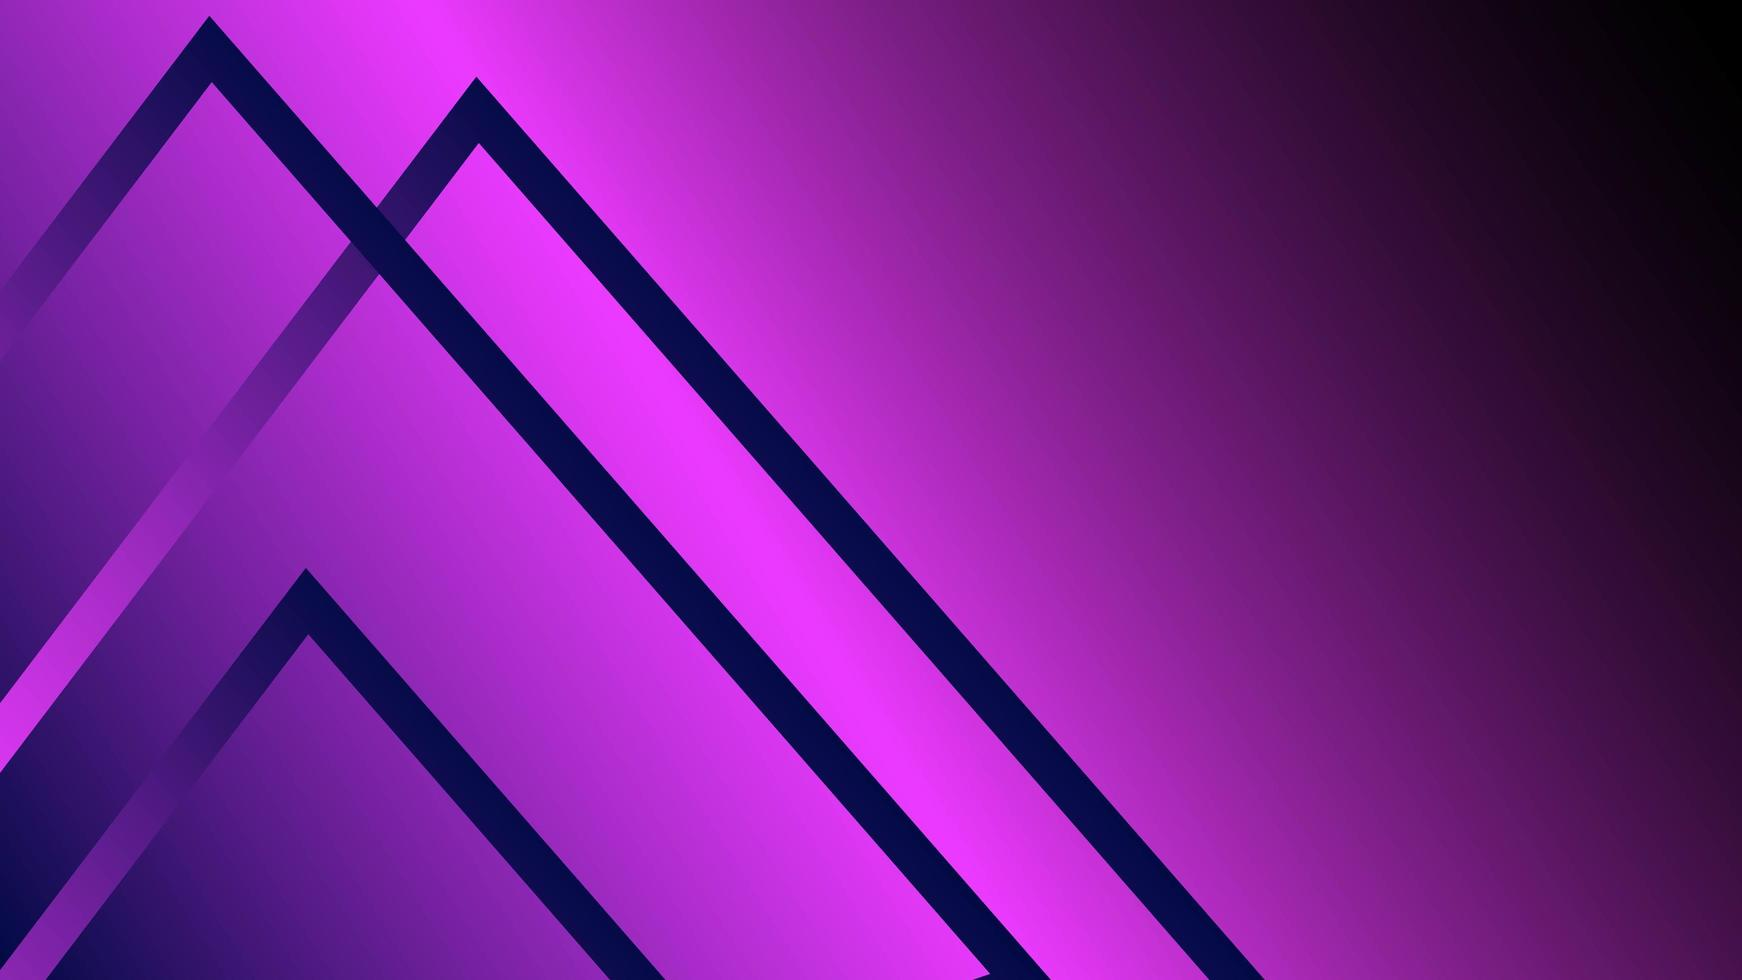 fondo abstracto con líneas de luz vector